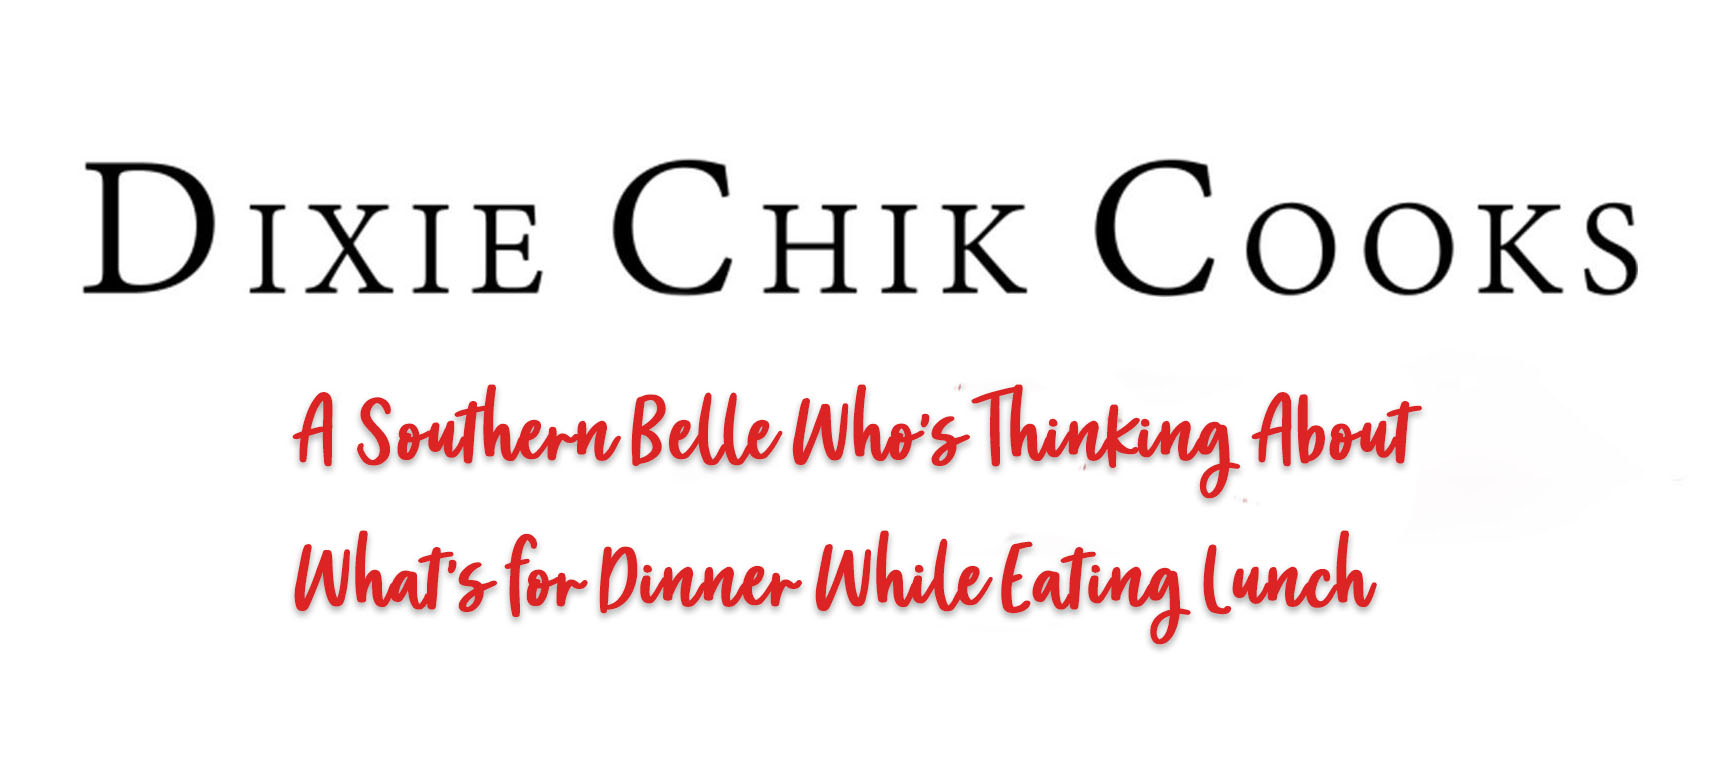 Dixie Chik Cooks